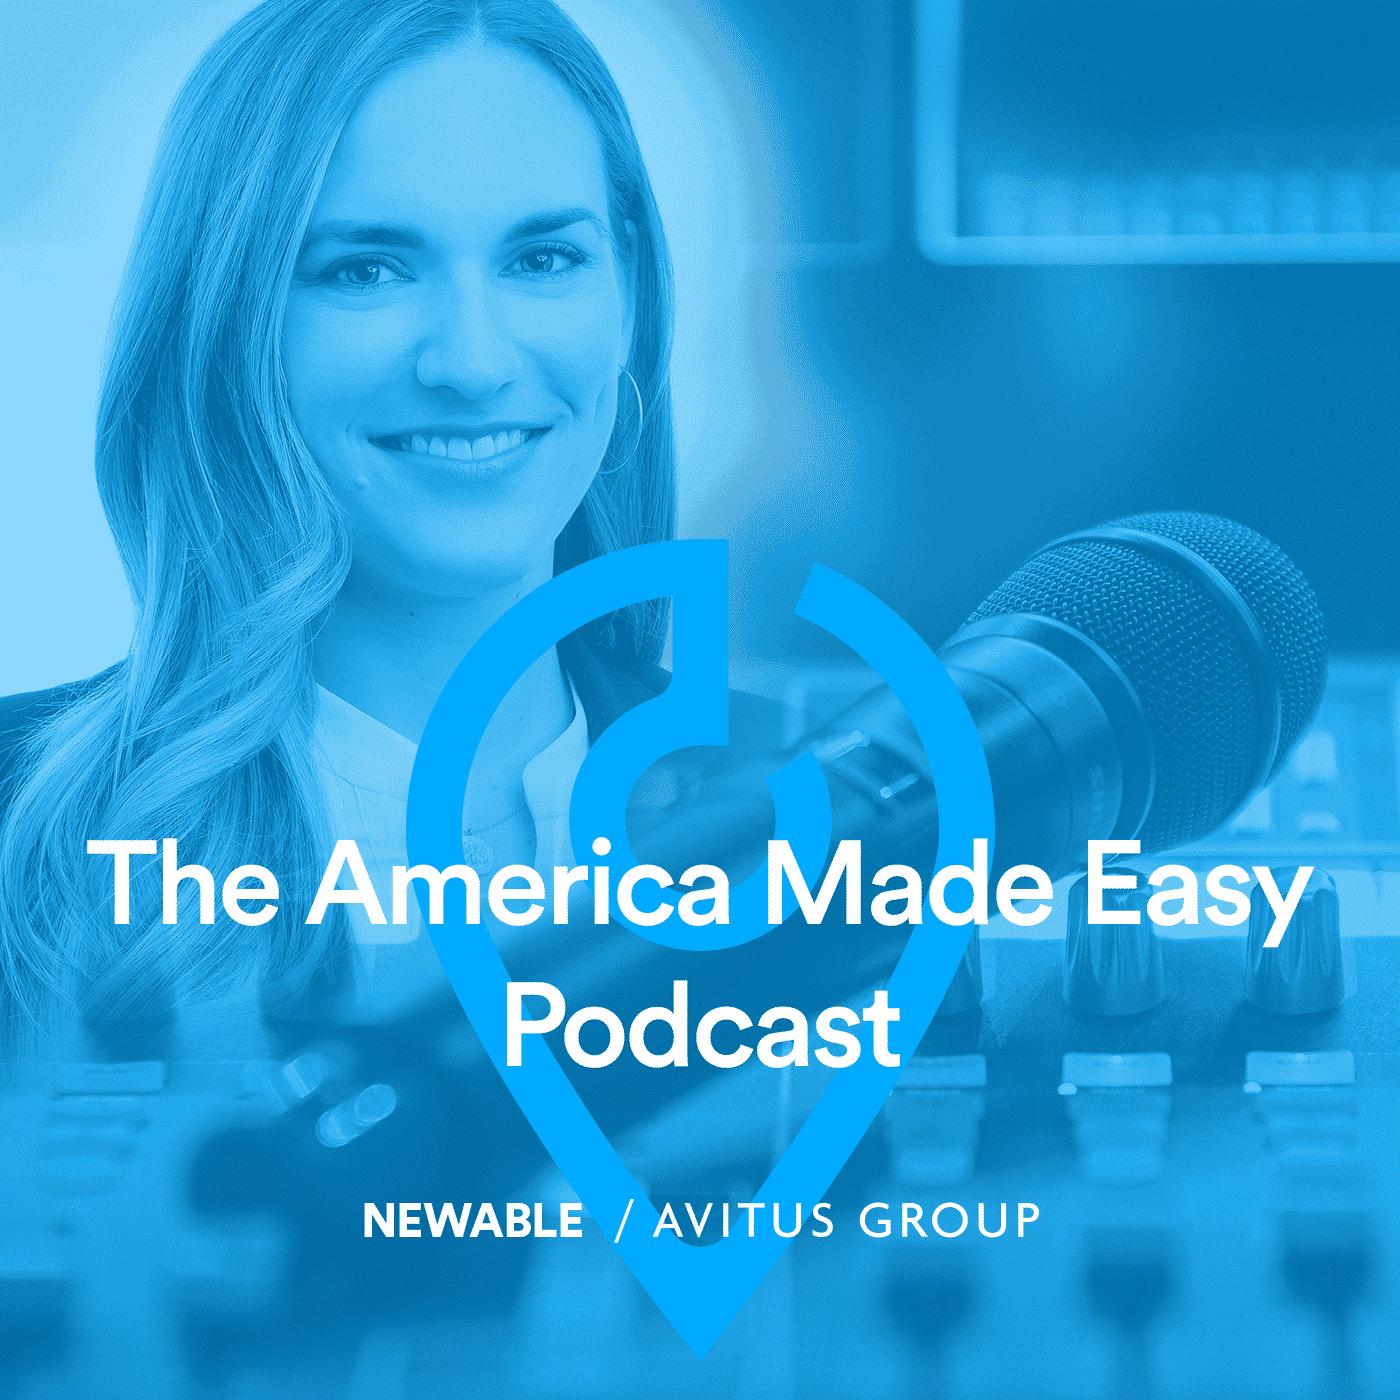 AME Podcast Morgan